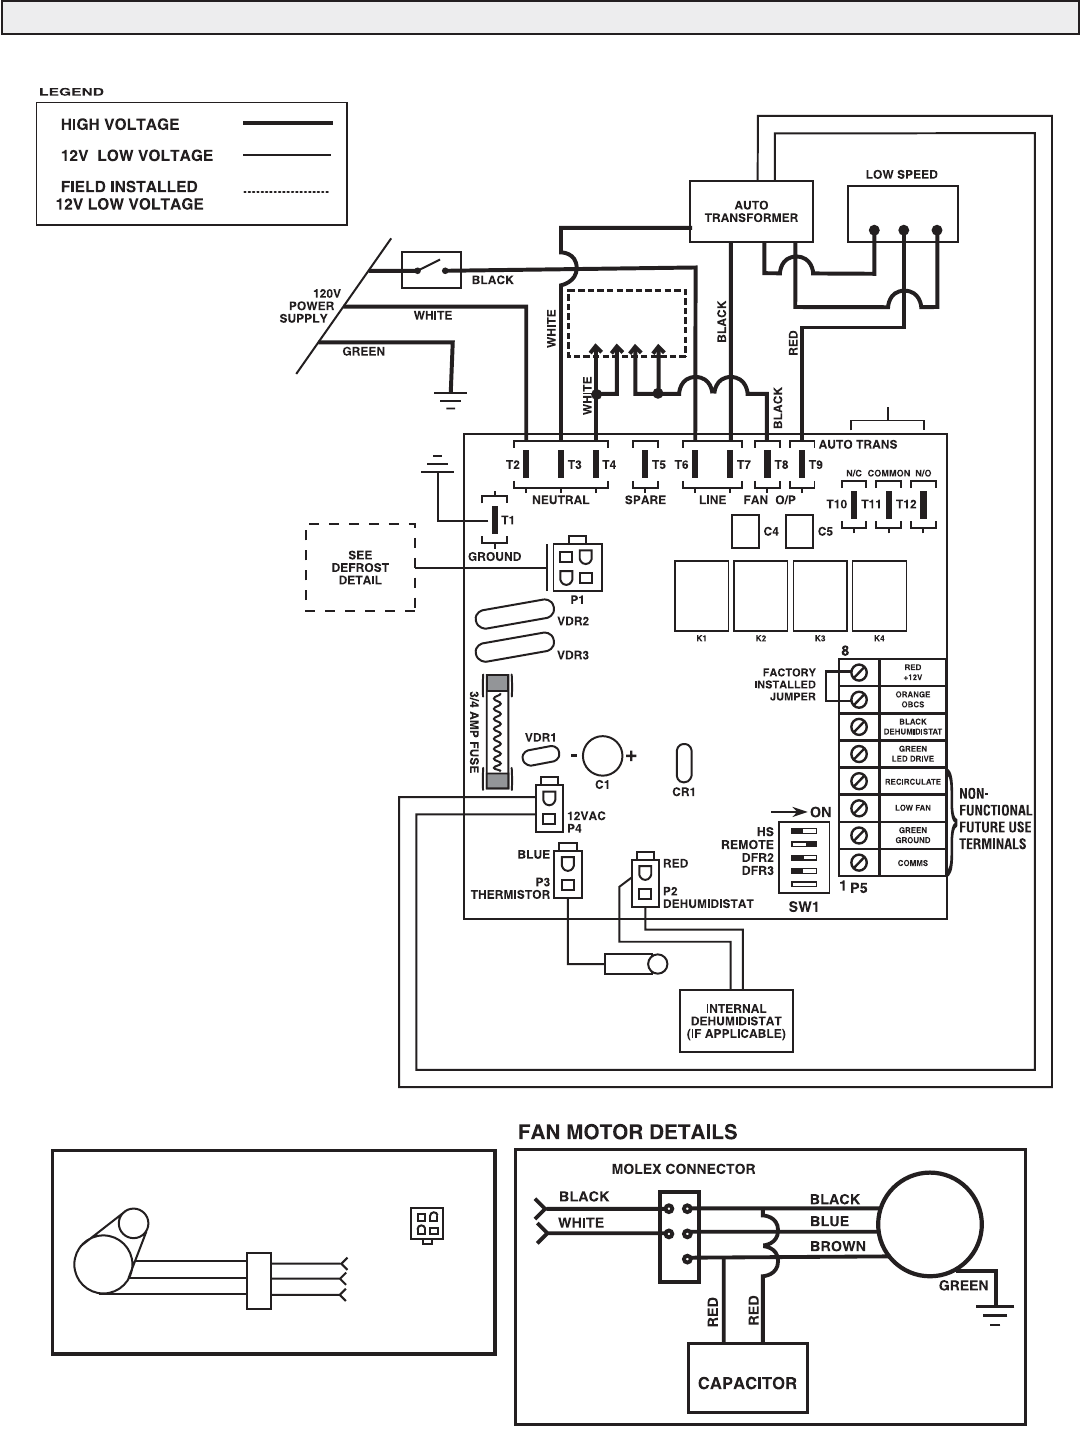 Lifebreath RNC10, RNC120D, RNC155, RNC20, RNC200, RNC5-TPD